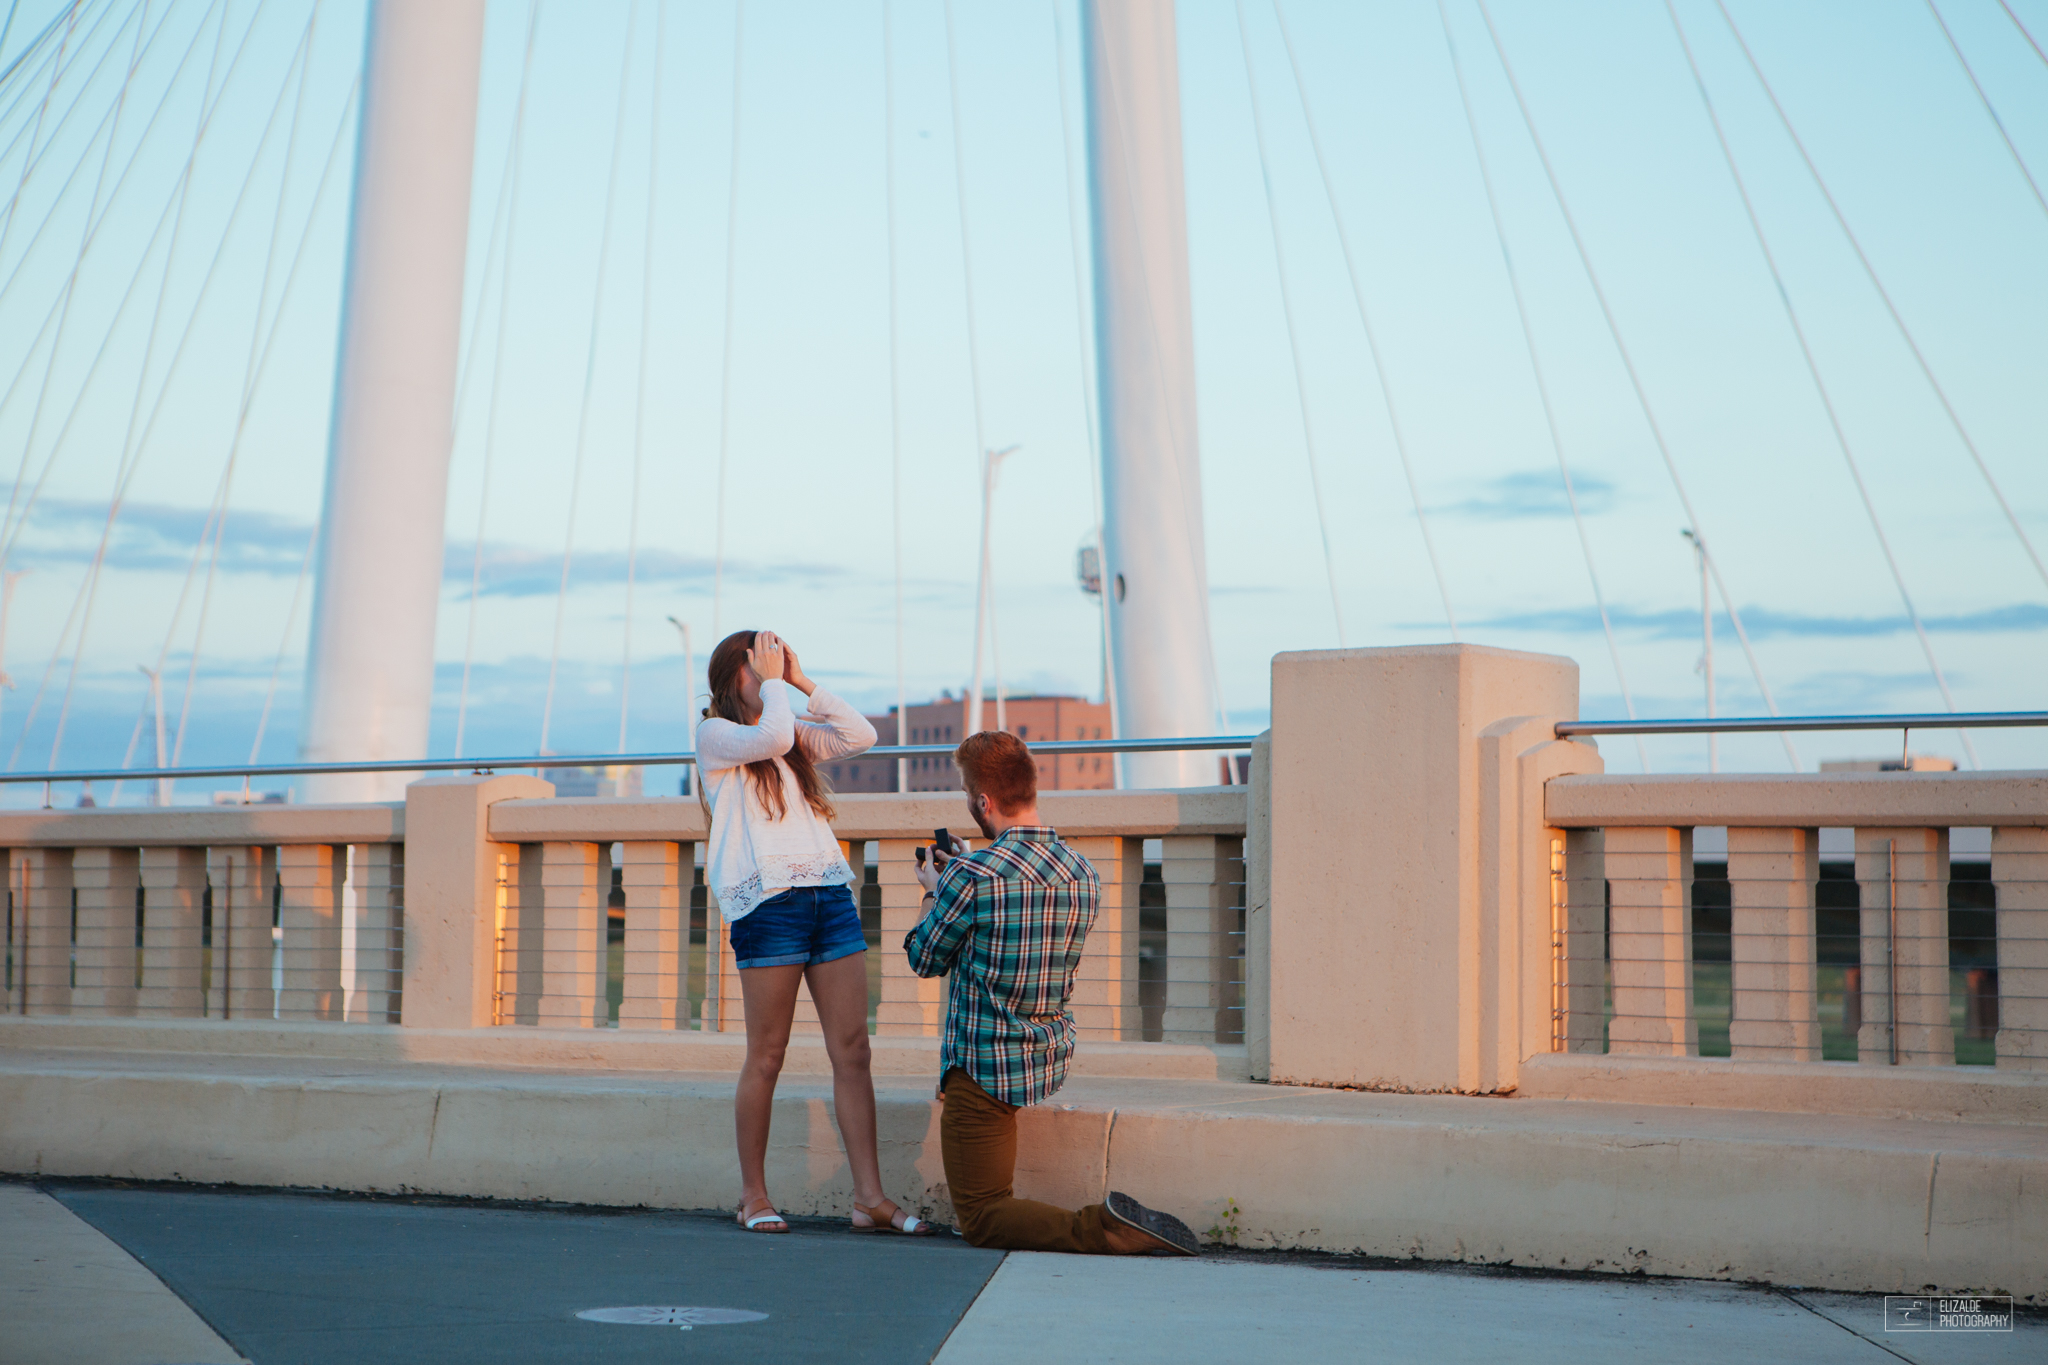 Proposal_DFW Wedding Photographer_Dallas Photographer_Elizalde Photography_margaret hunt hill bridge (2 of 21).jpg